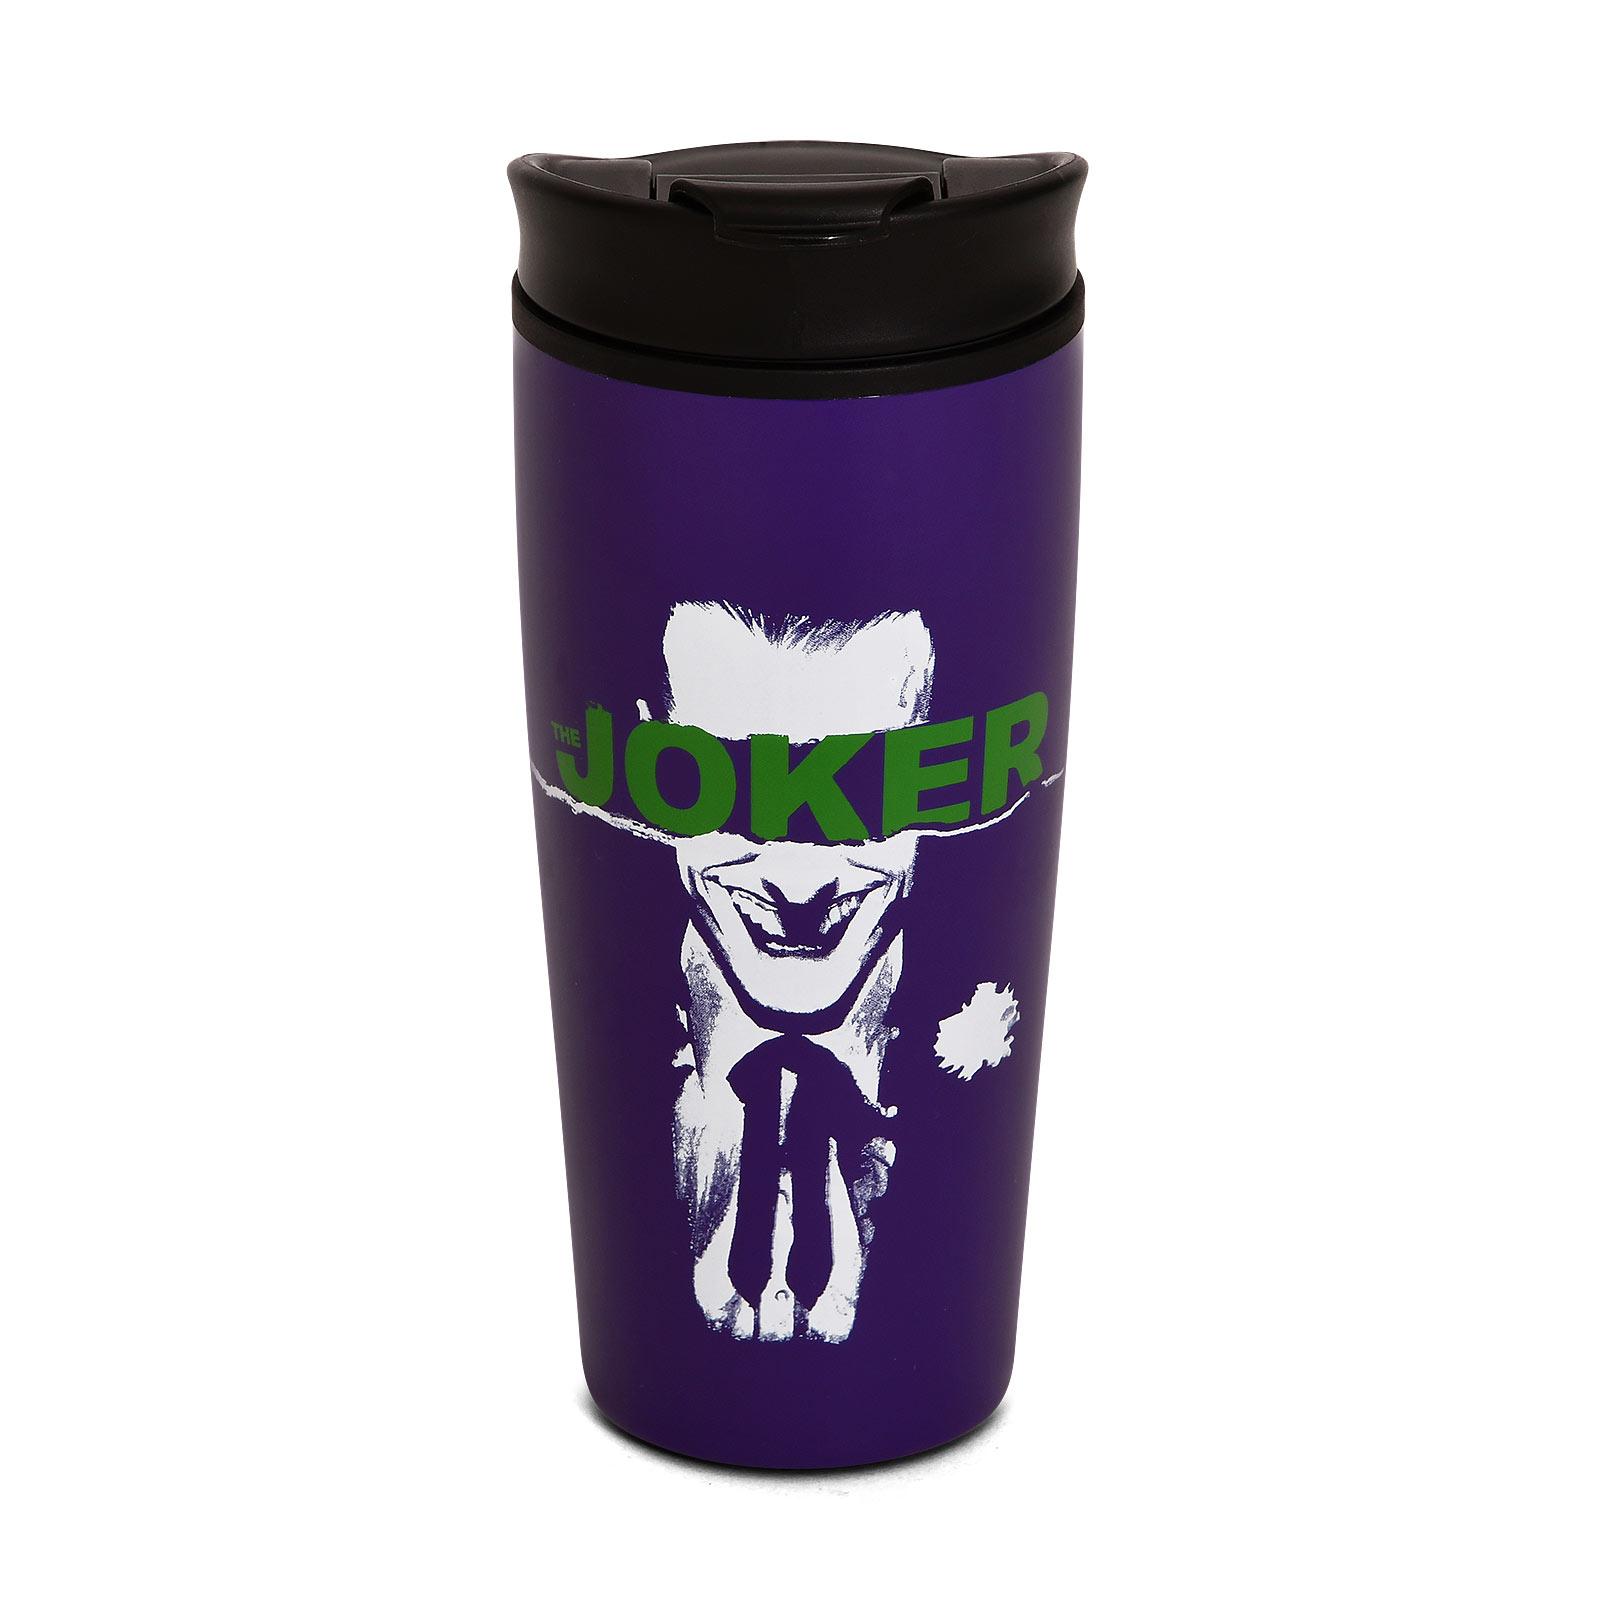 Joker - Straight Outta Arkham To Go Becher